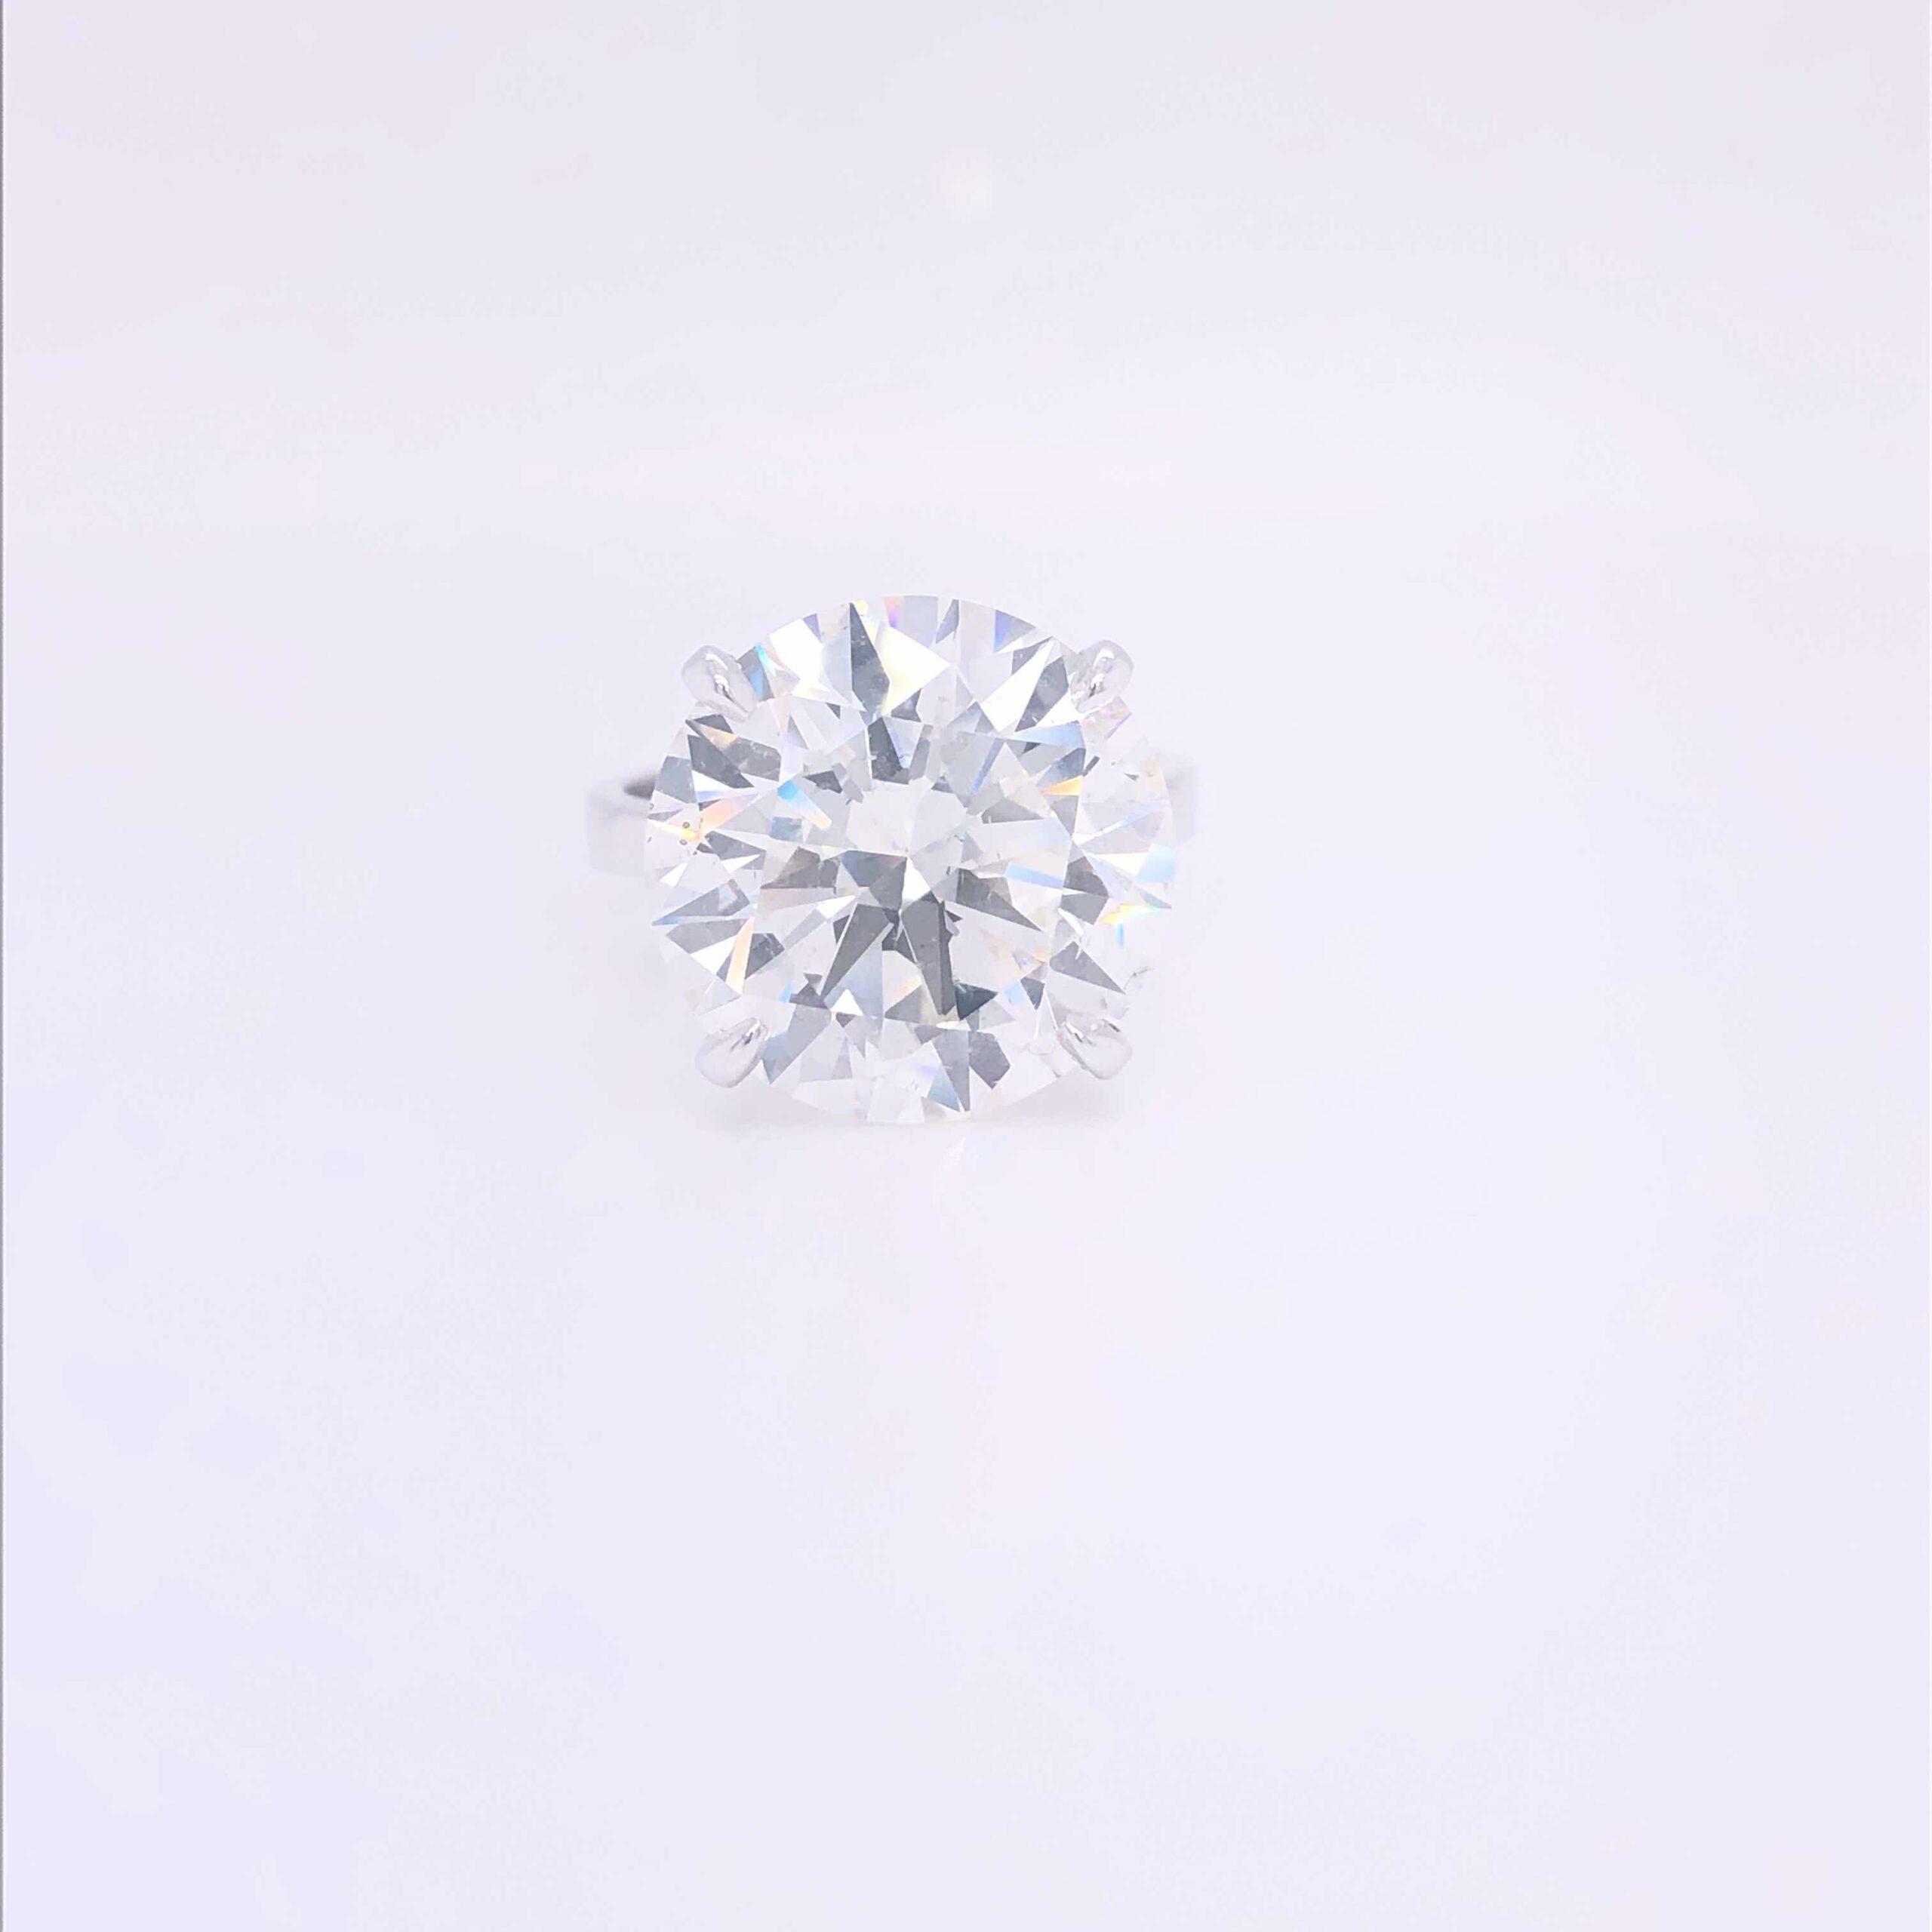 Diamond Buyer Aventura, FL | Diamond Buyer Near Me